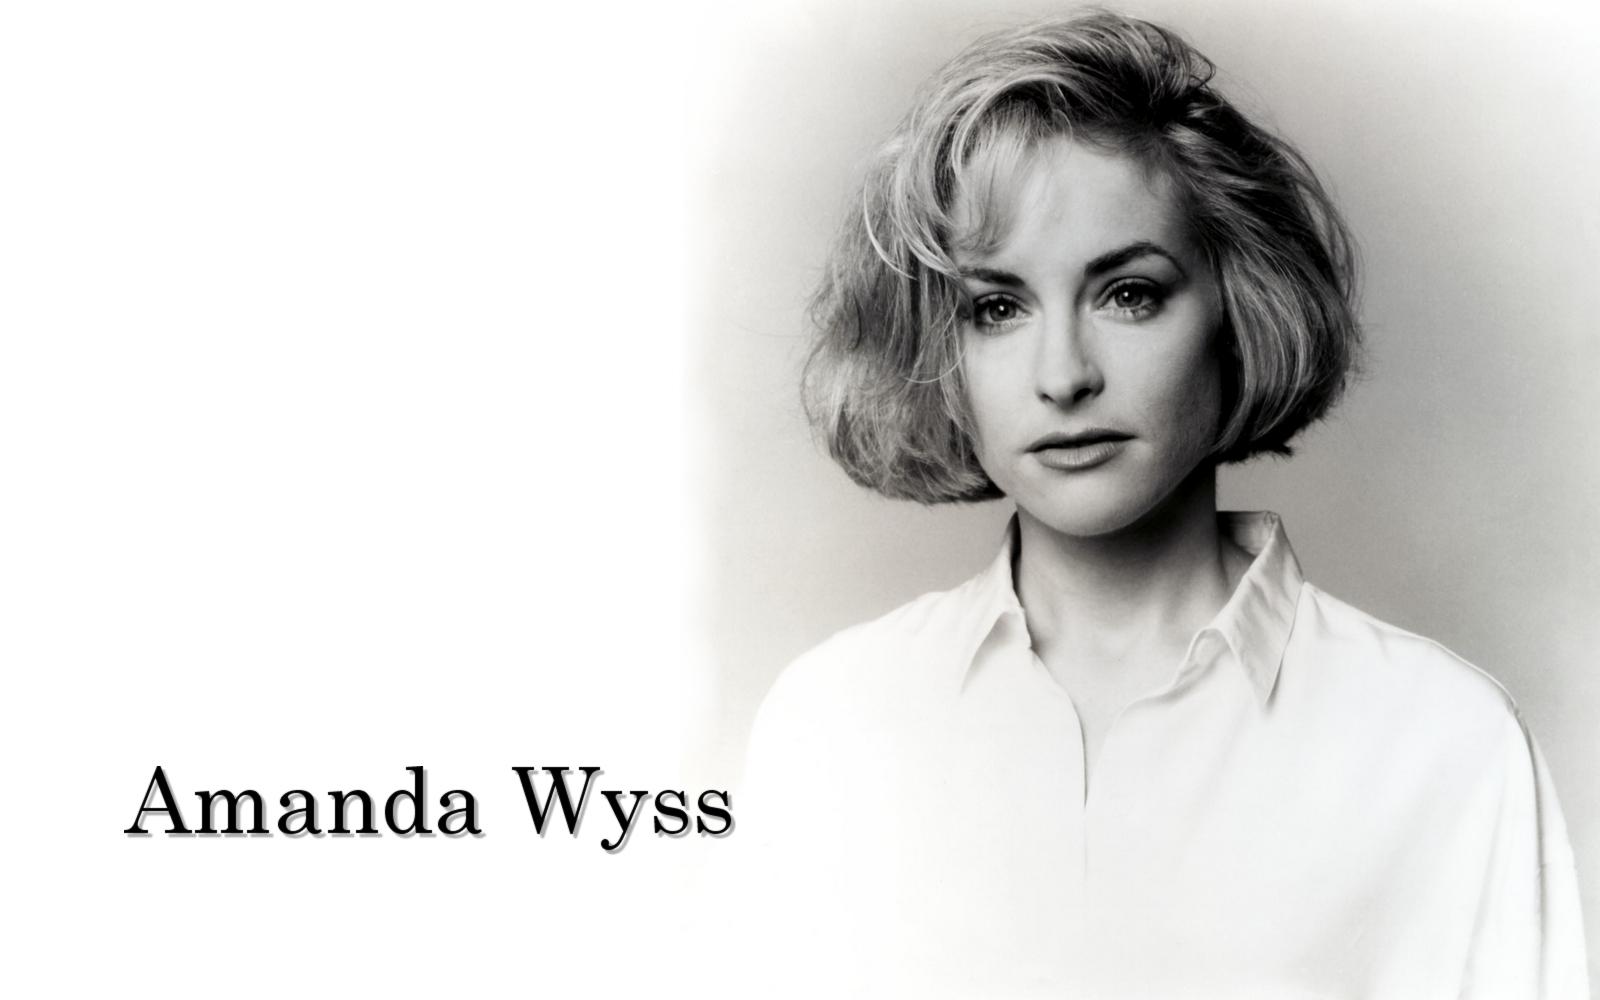 Amanda Wyss Photos wallpaperboard: 02 amanda wyss wallpaper